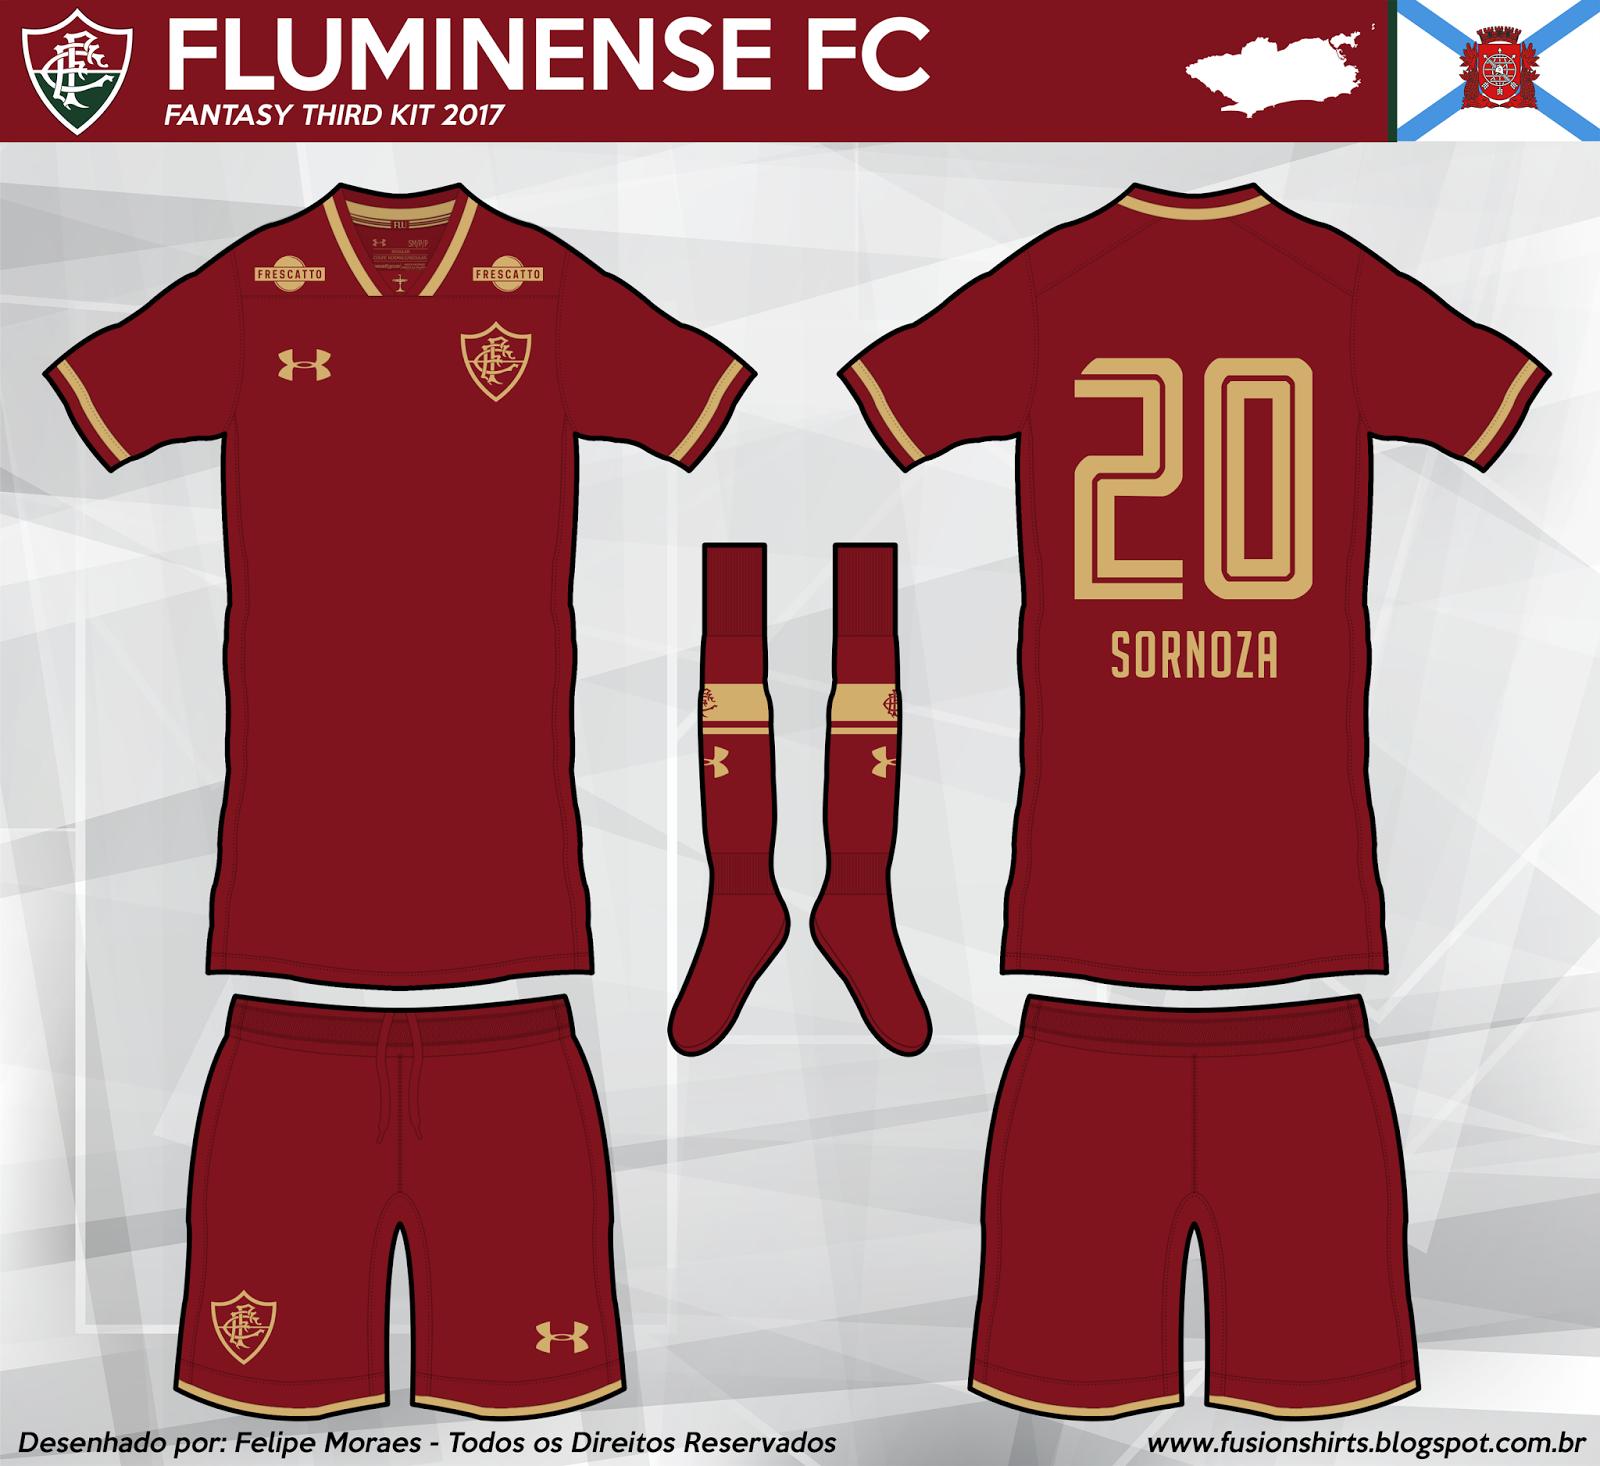 0d045da1b1 Fluminense + Under Armour - Palpites